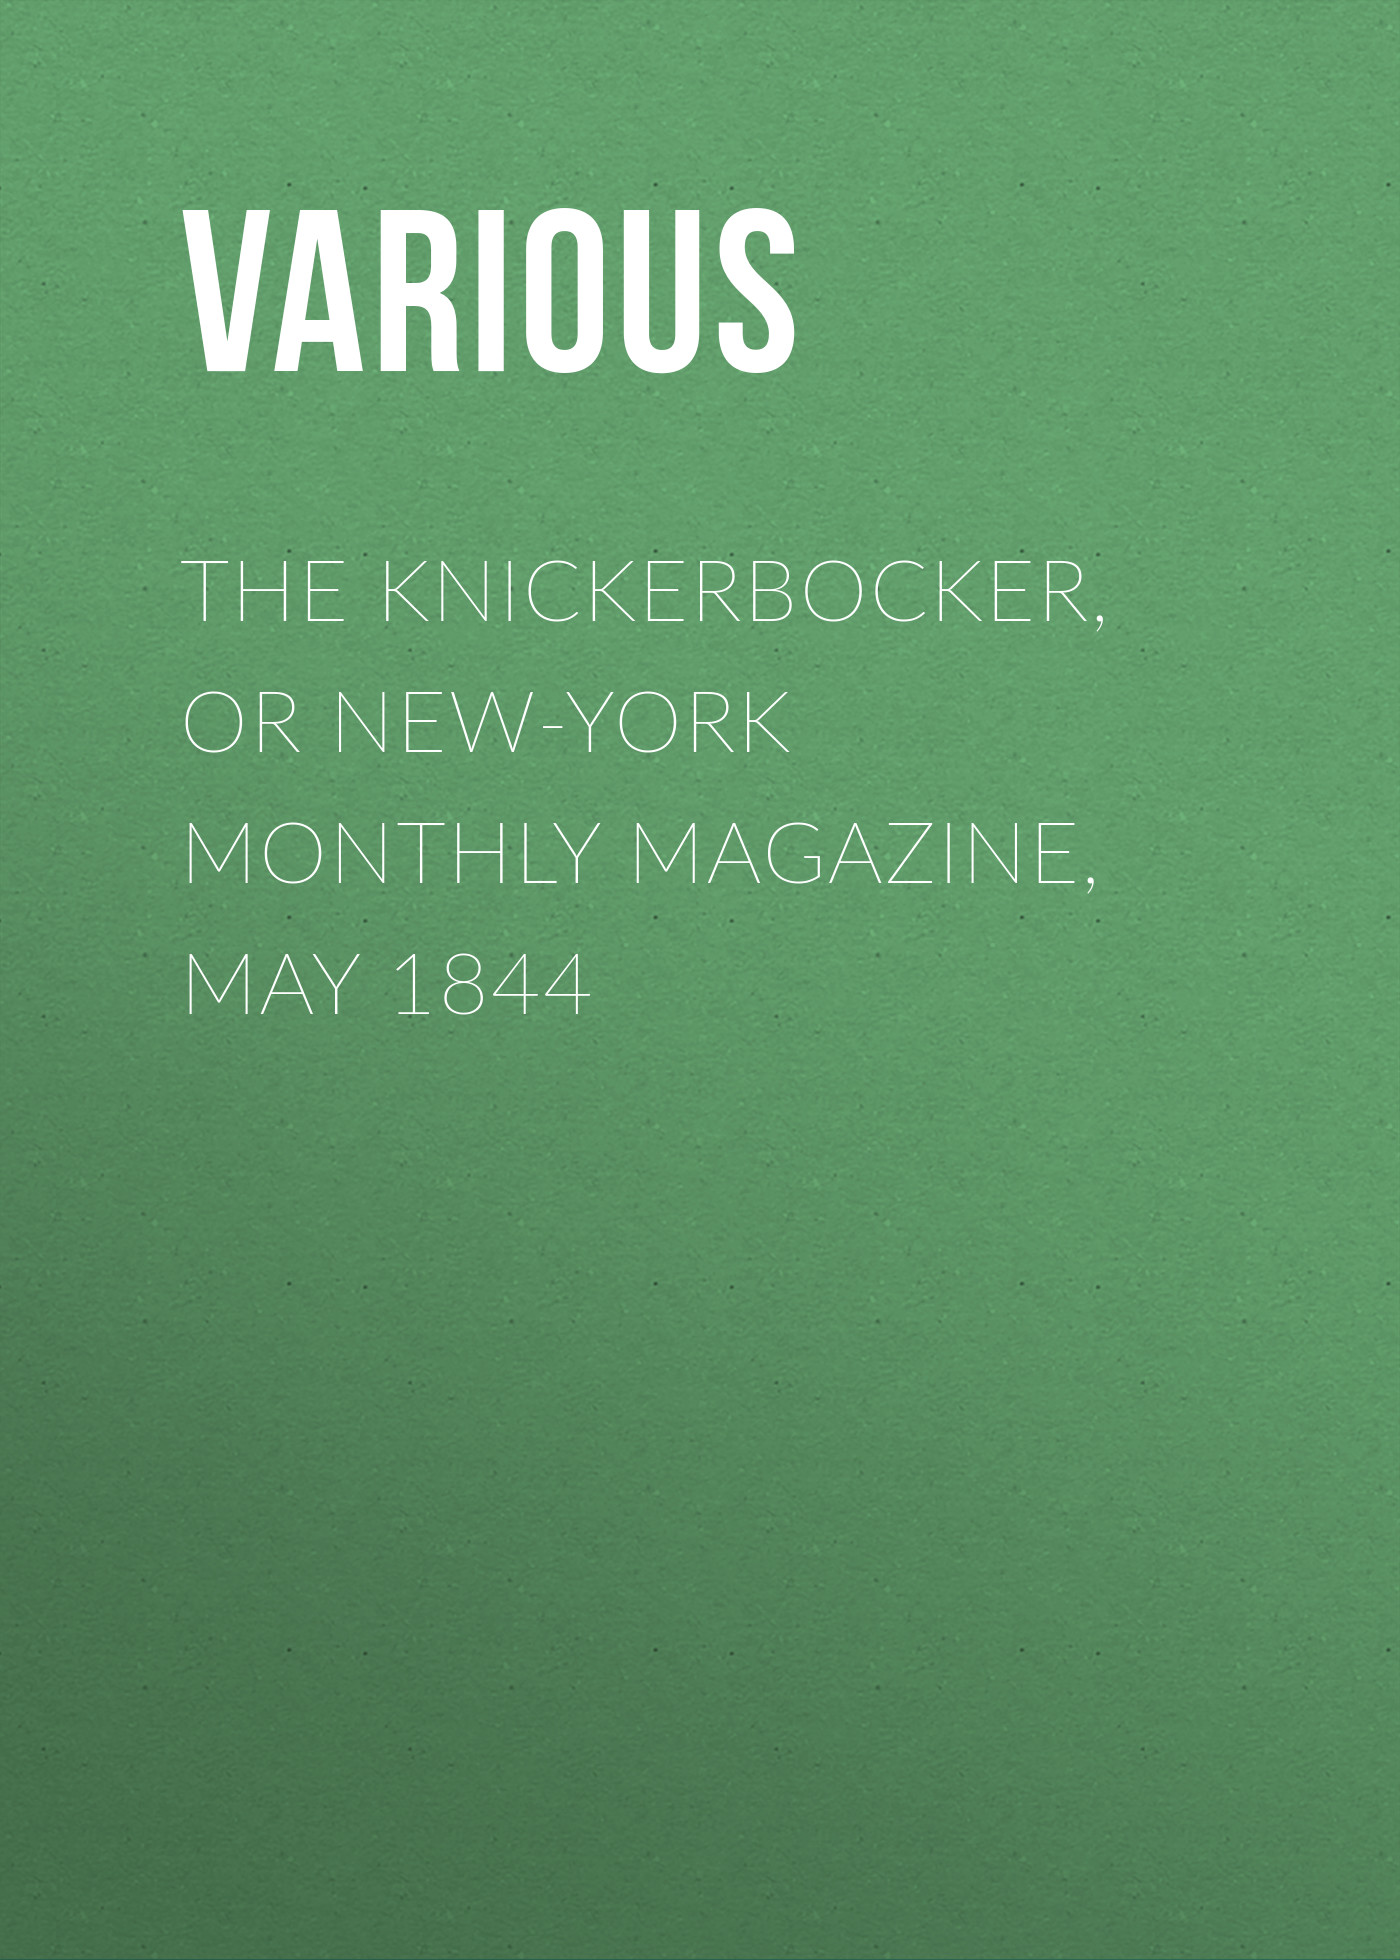 лучшая цена Various The Knickerbocker, or New-York Monthly Magazine, May 1844